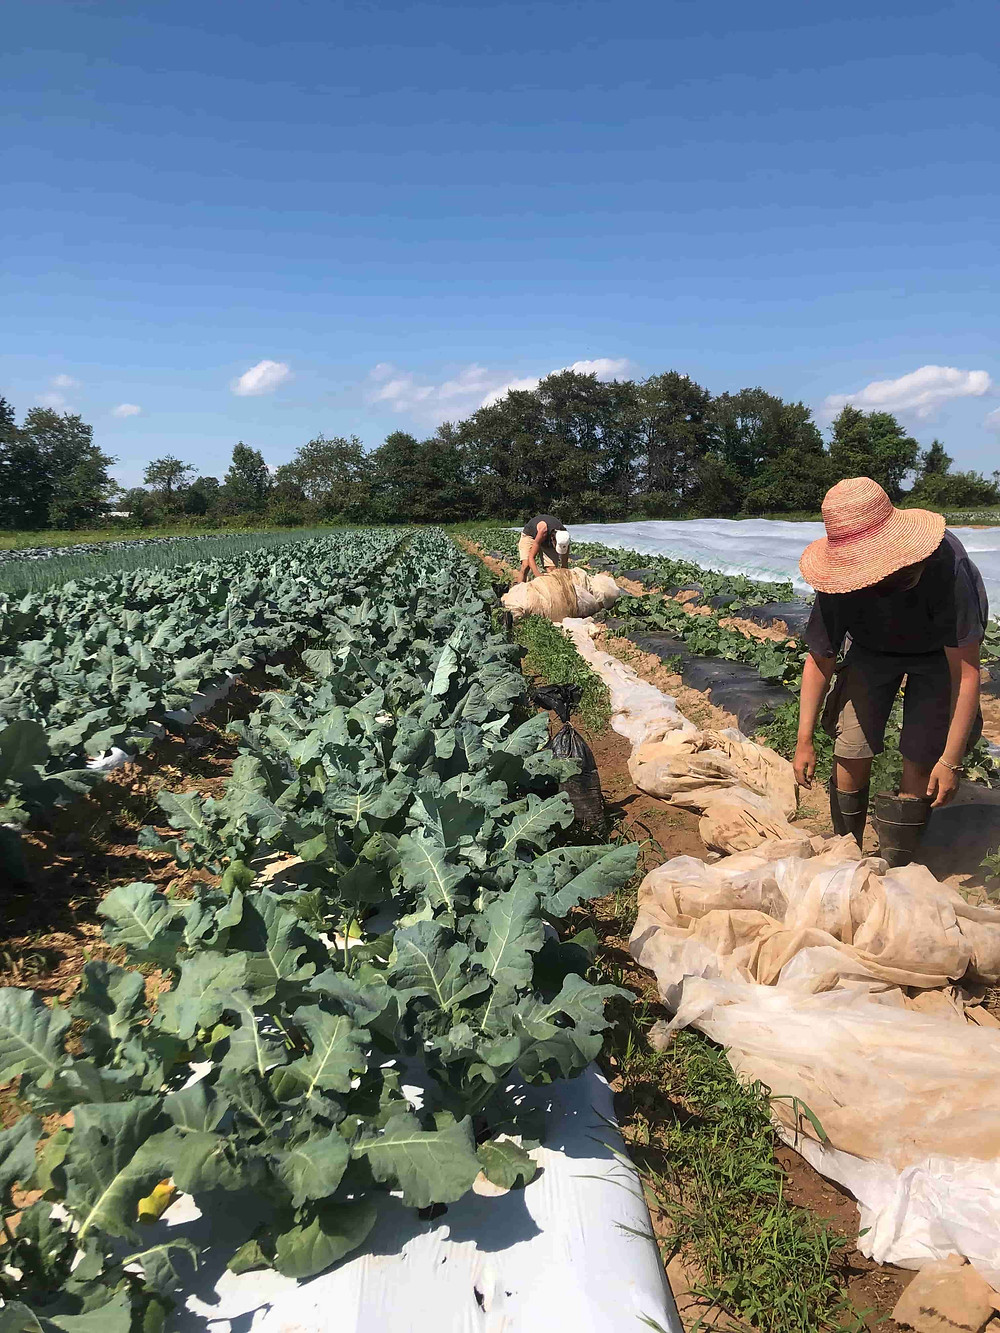 Kale crops and CSA farm crew at work